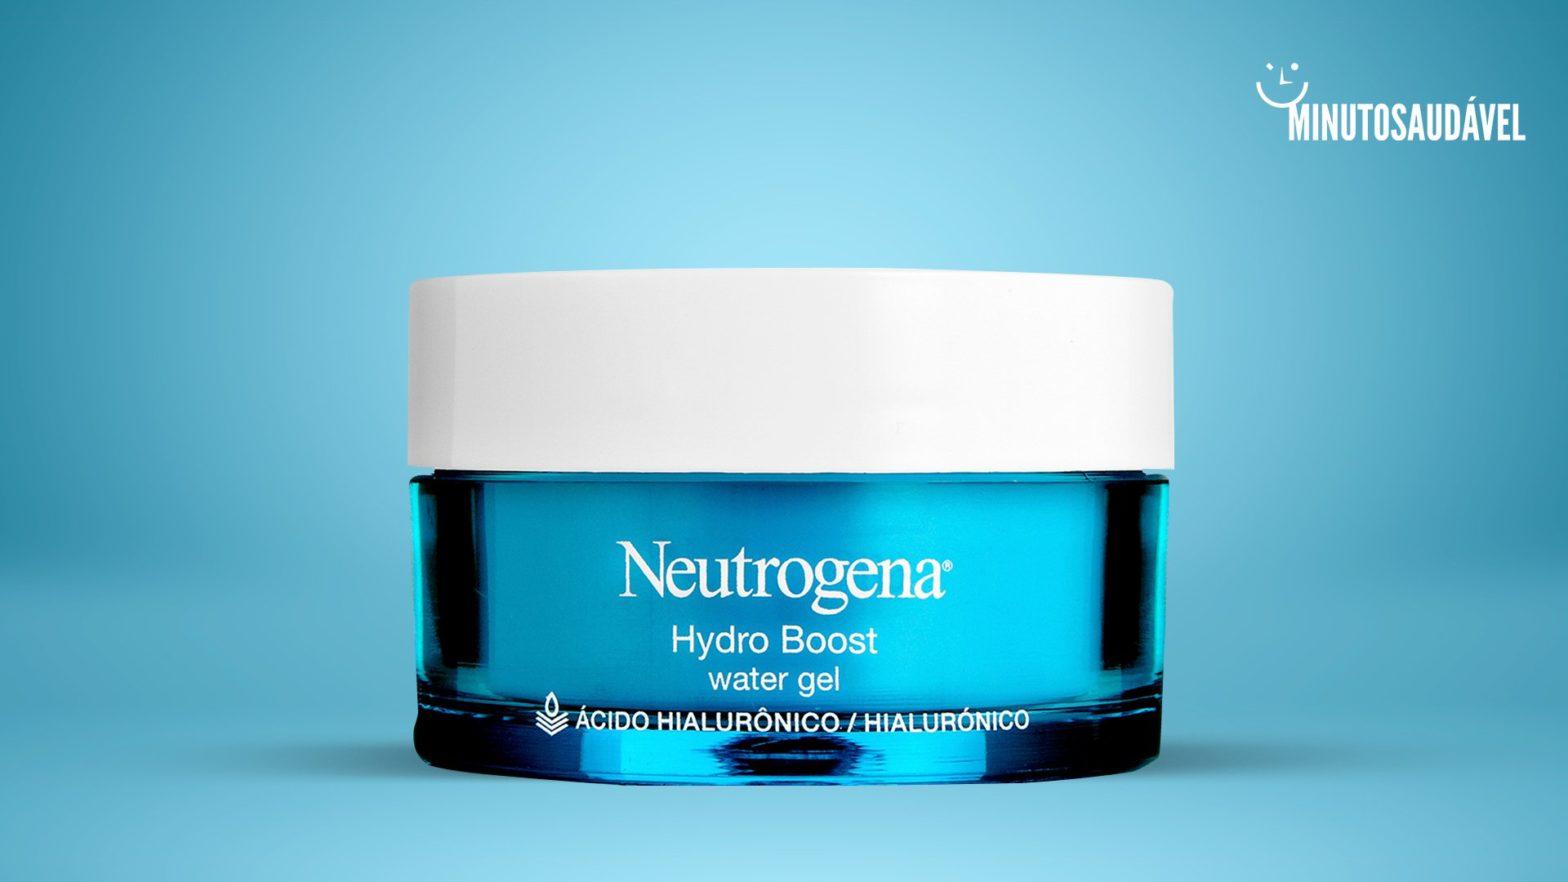 316ac30effb Resenha Neutrogena Hydro Boost Water Gel: é bom para pele oleosa?